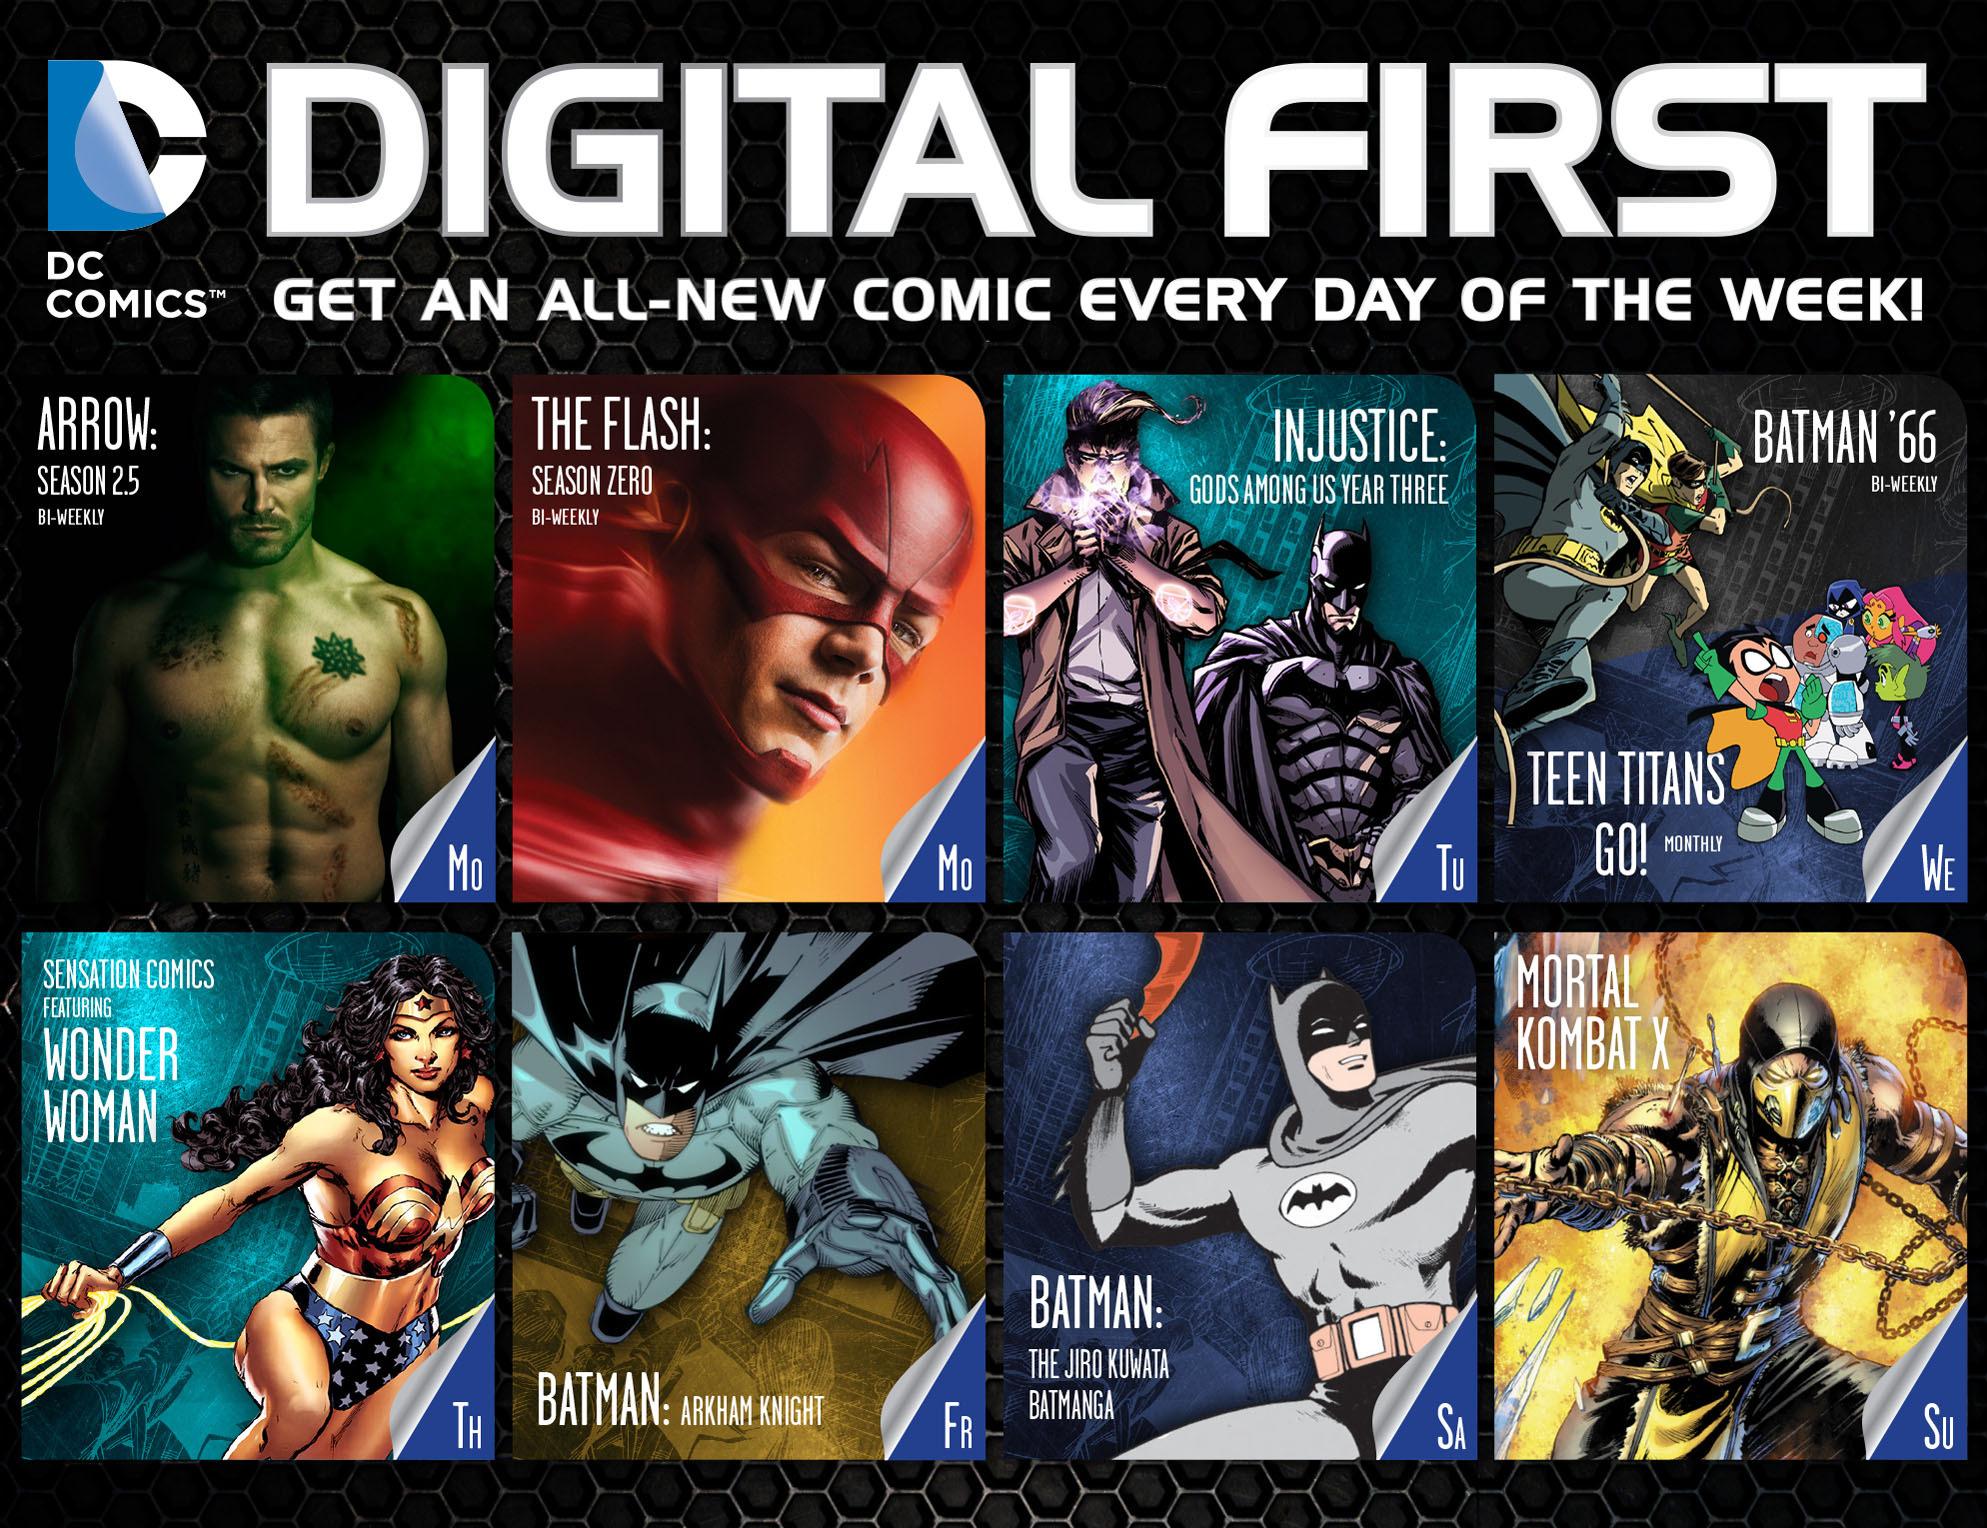 Batman: Arkham Knight [I] Issue #4 #6 - English 23